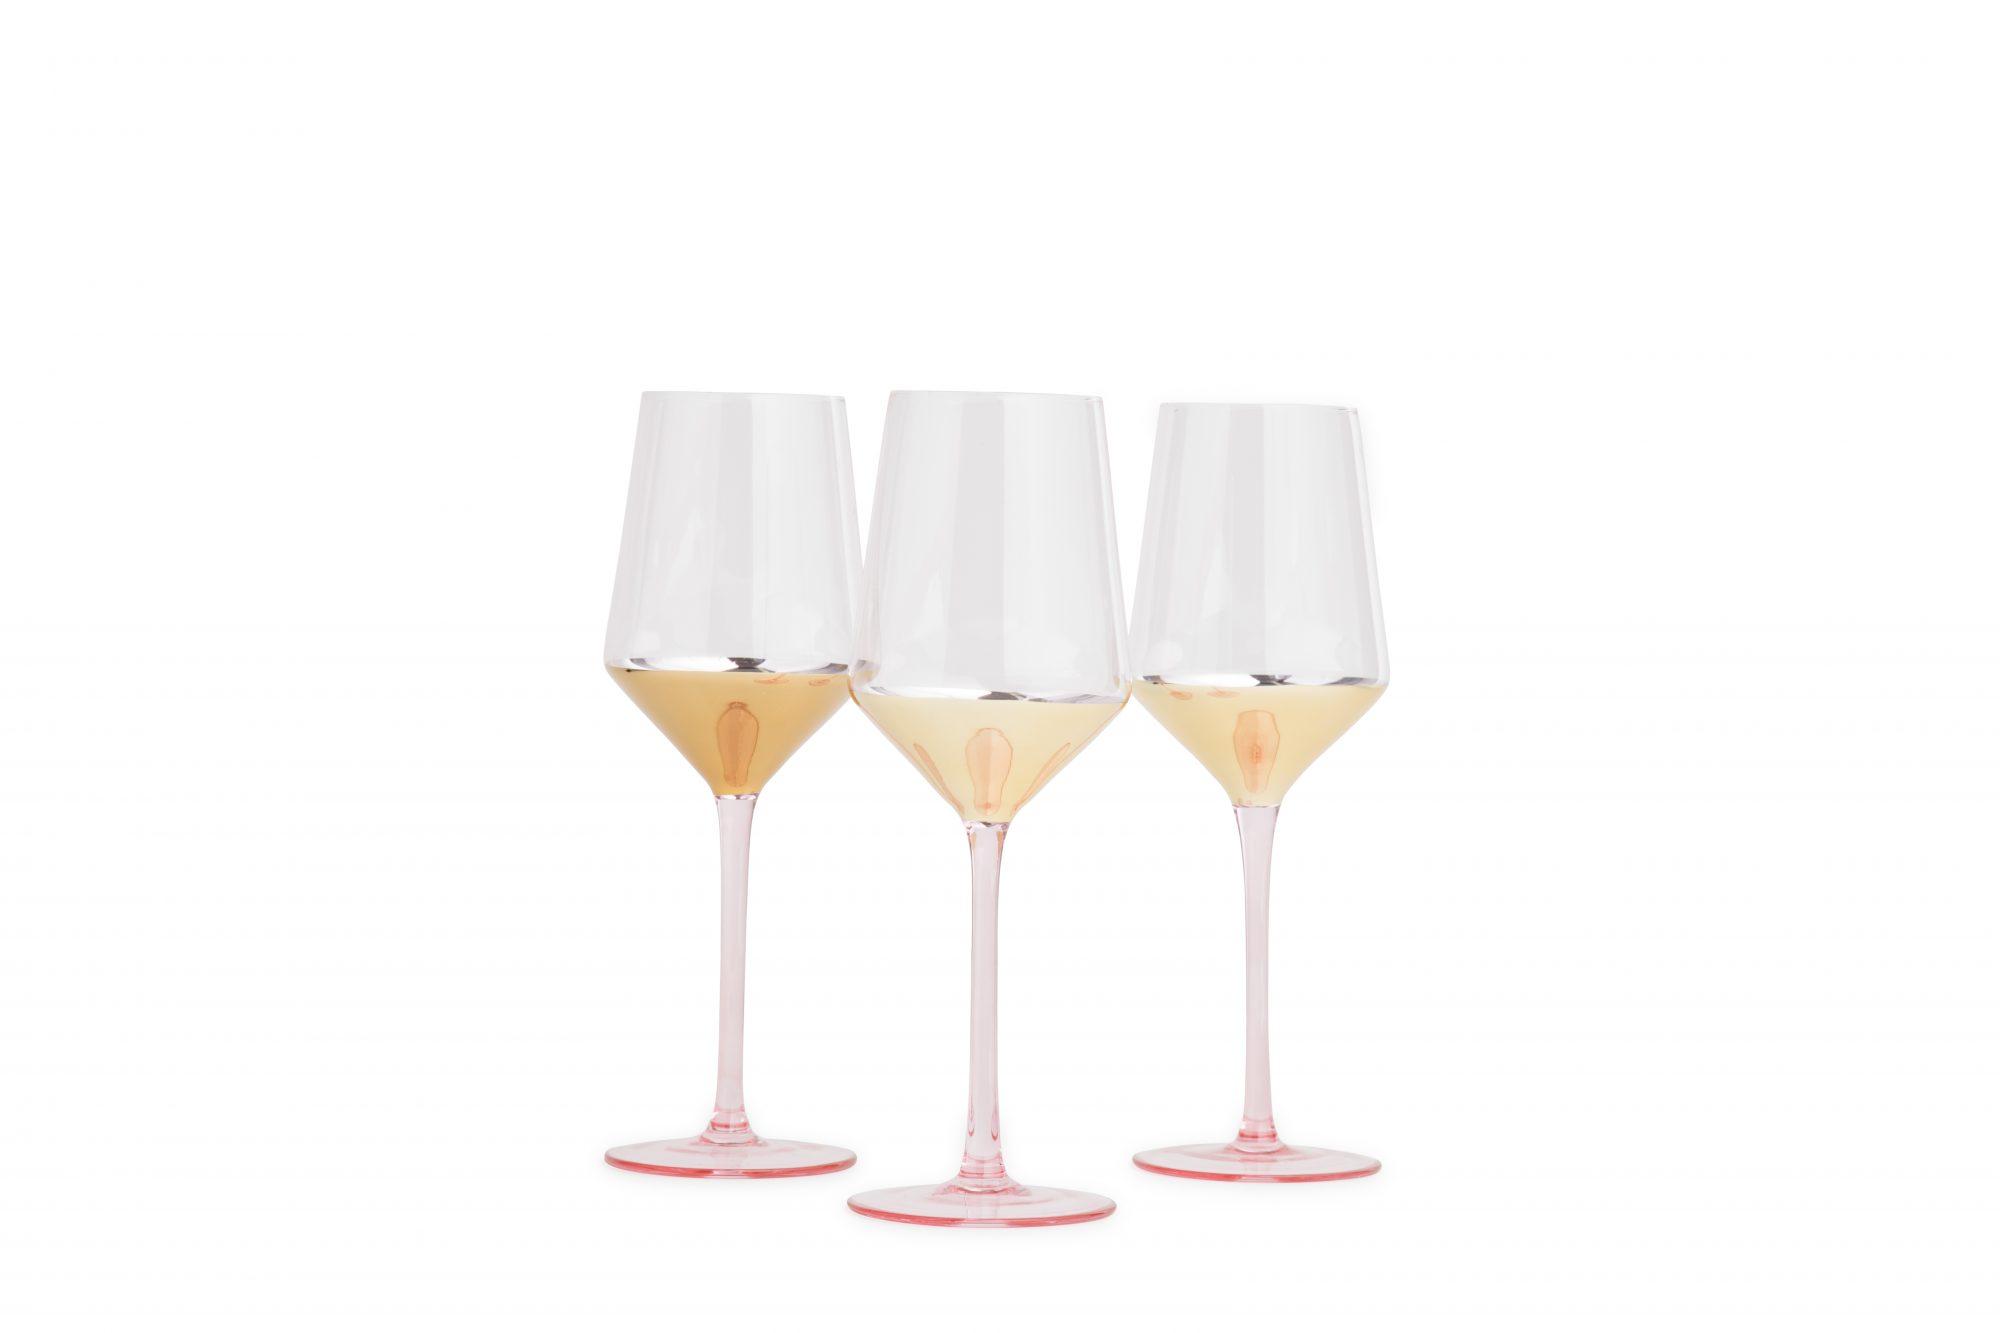 hg_176650_pink_glass_set-r.jpg